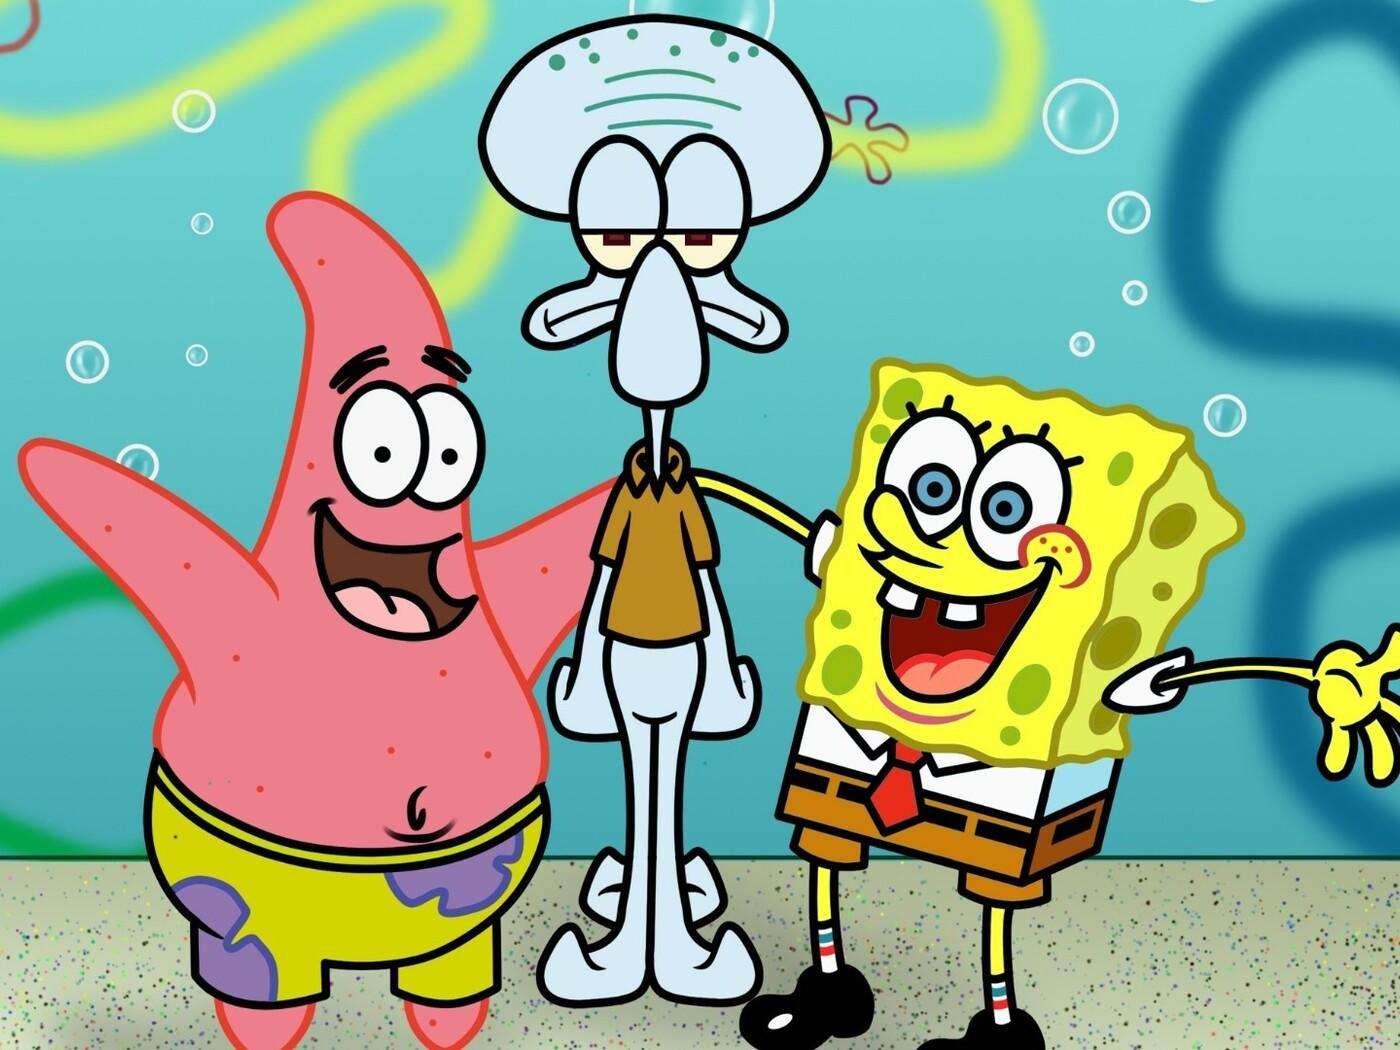 Download Gratis Video Kartun Spongebob Wwwtodirepetk